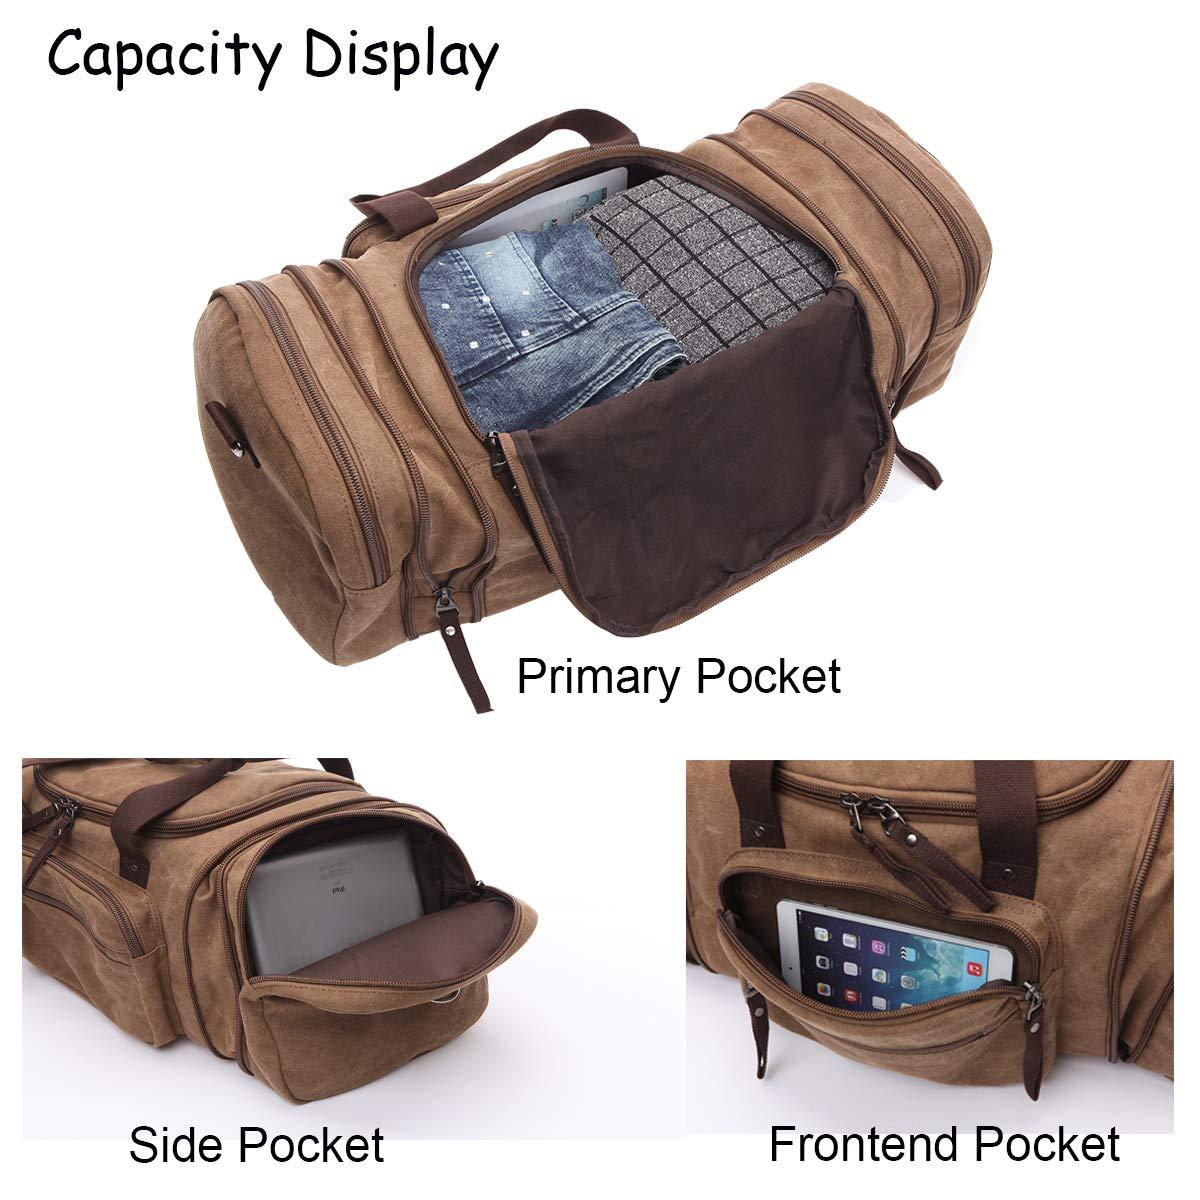 Fashion Men and Women 20 Travel Duffel Bag Large Canvas Gym Sports Handbag Vintage Weekender Luggage Bag Overnight Carryon Tote Shoulder Bag 53/×25/×30cm